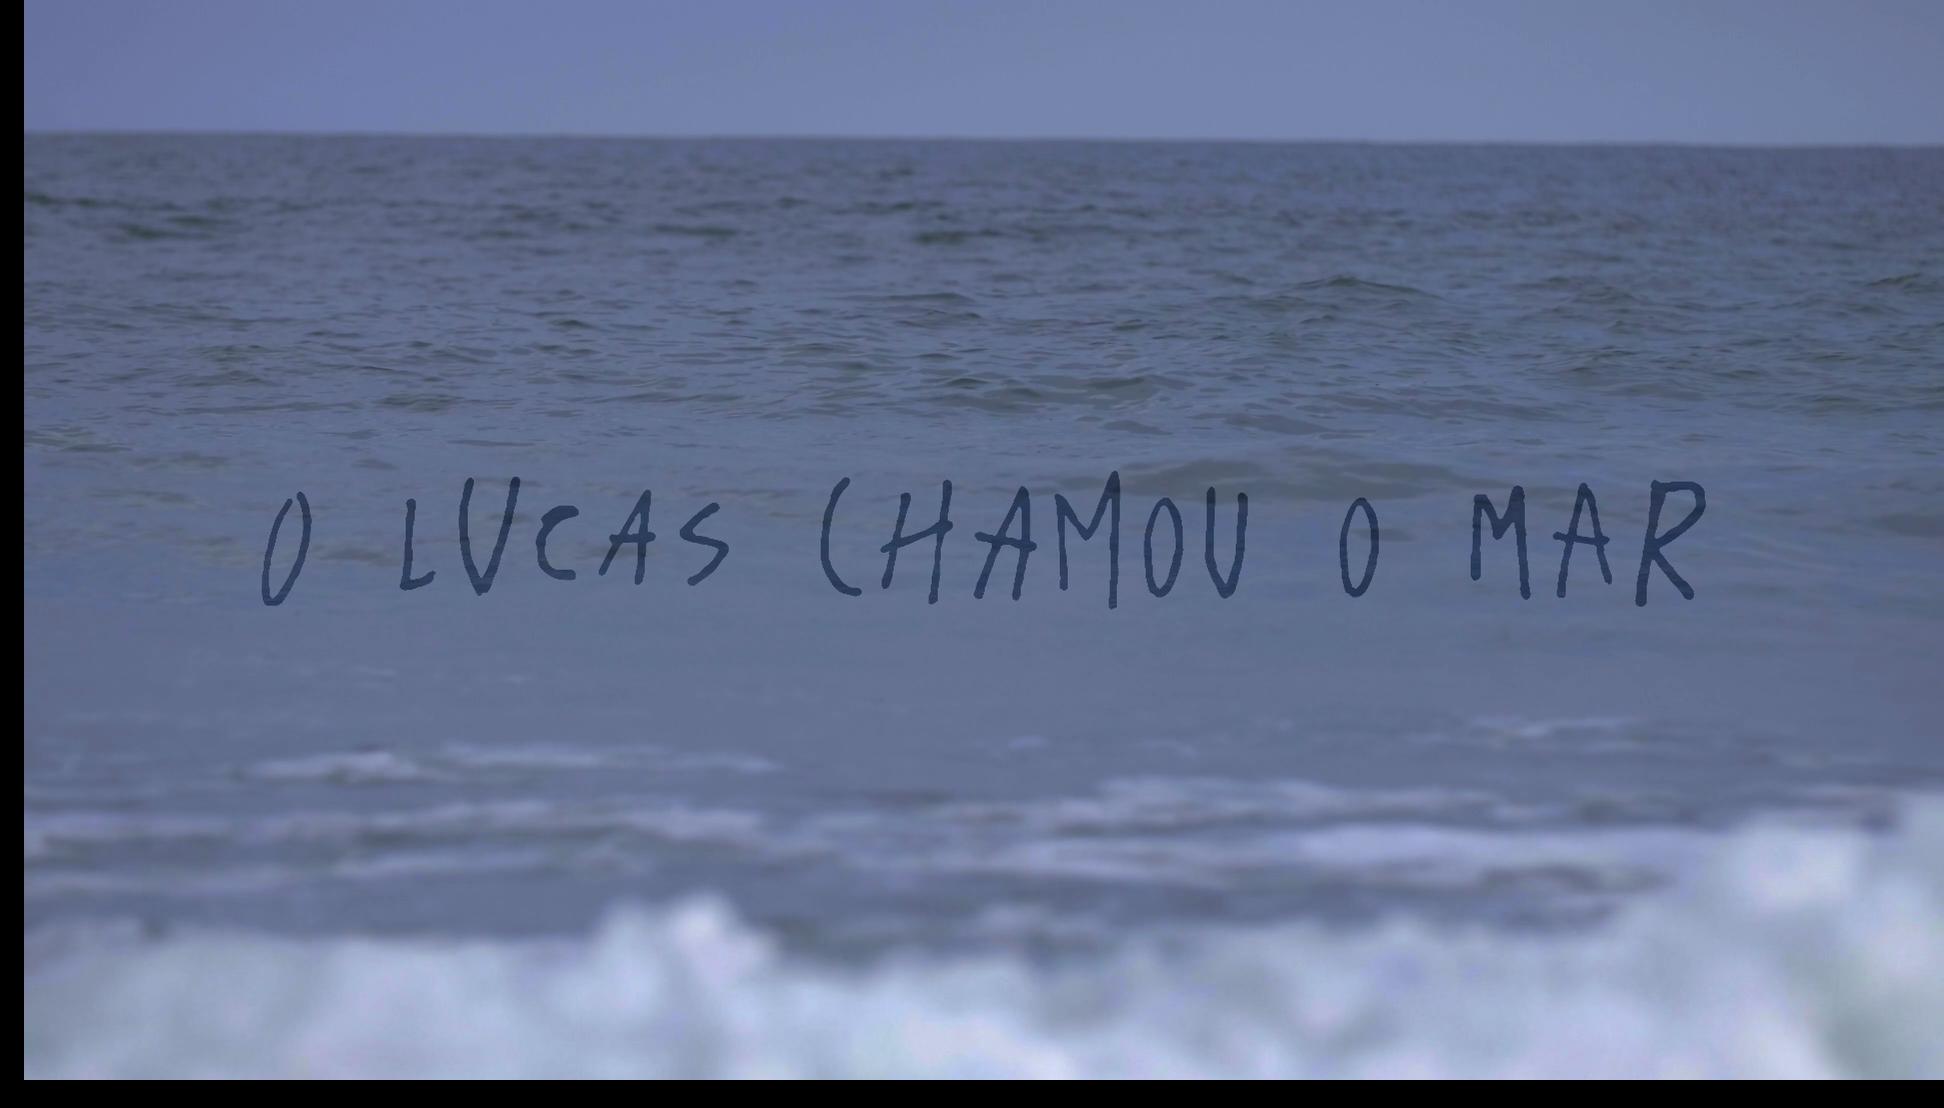 O Luca Chamou o Mar